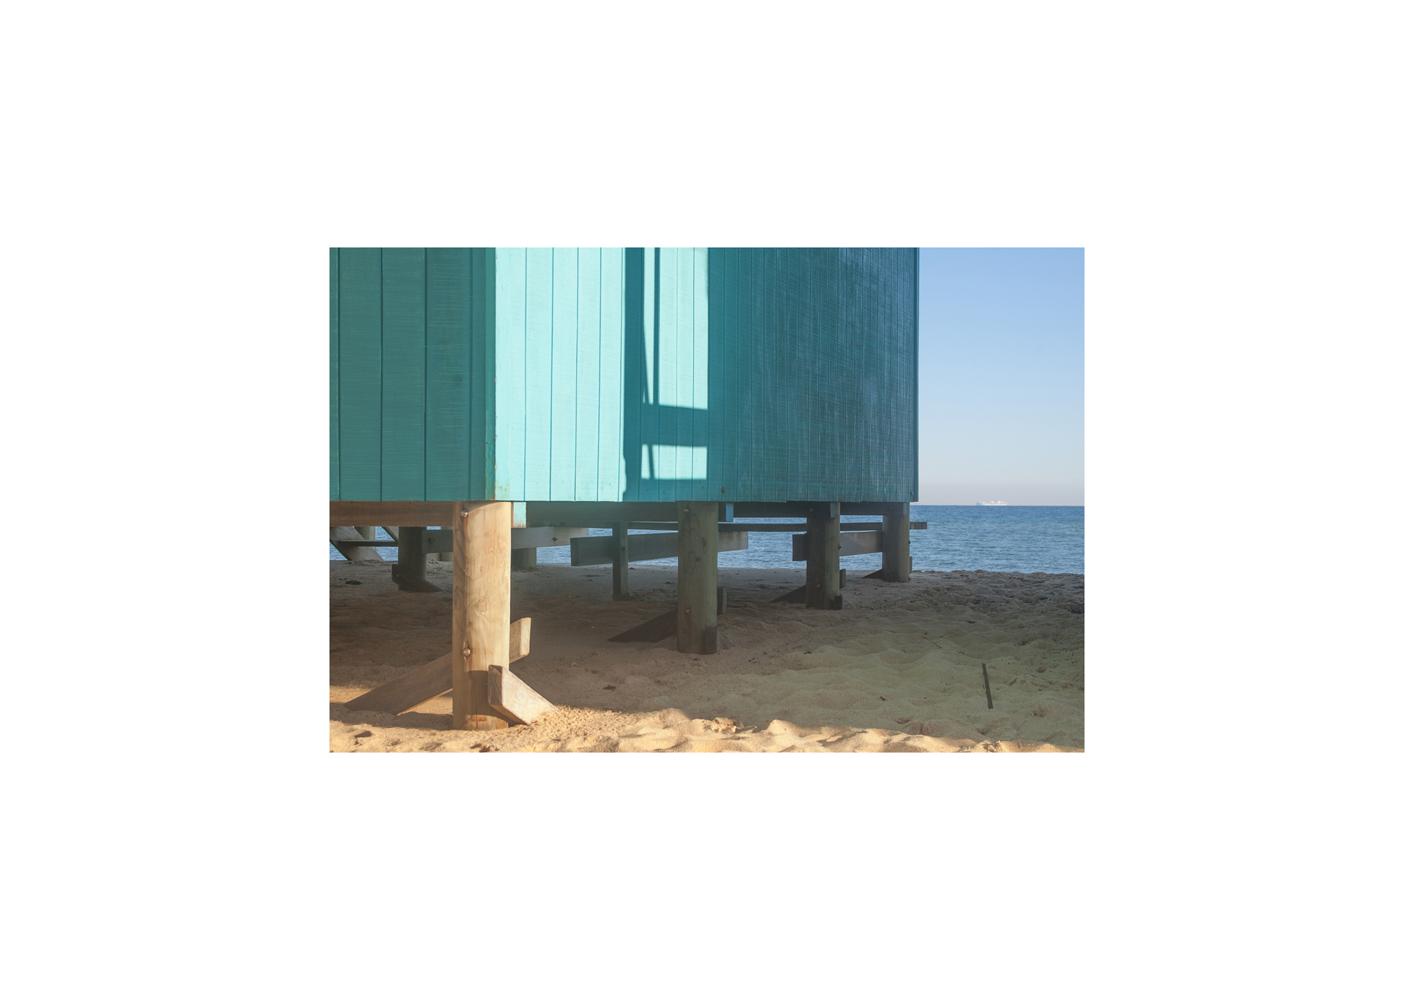 Beach study 2. 2020, archival pigment print, 15 x 22 cm